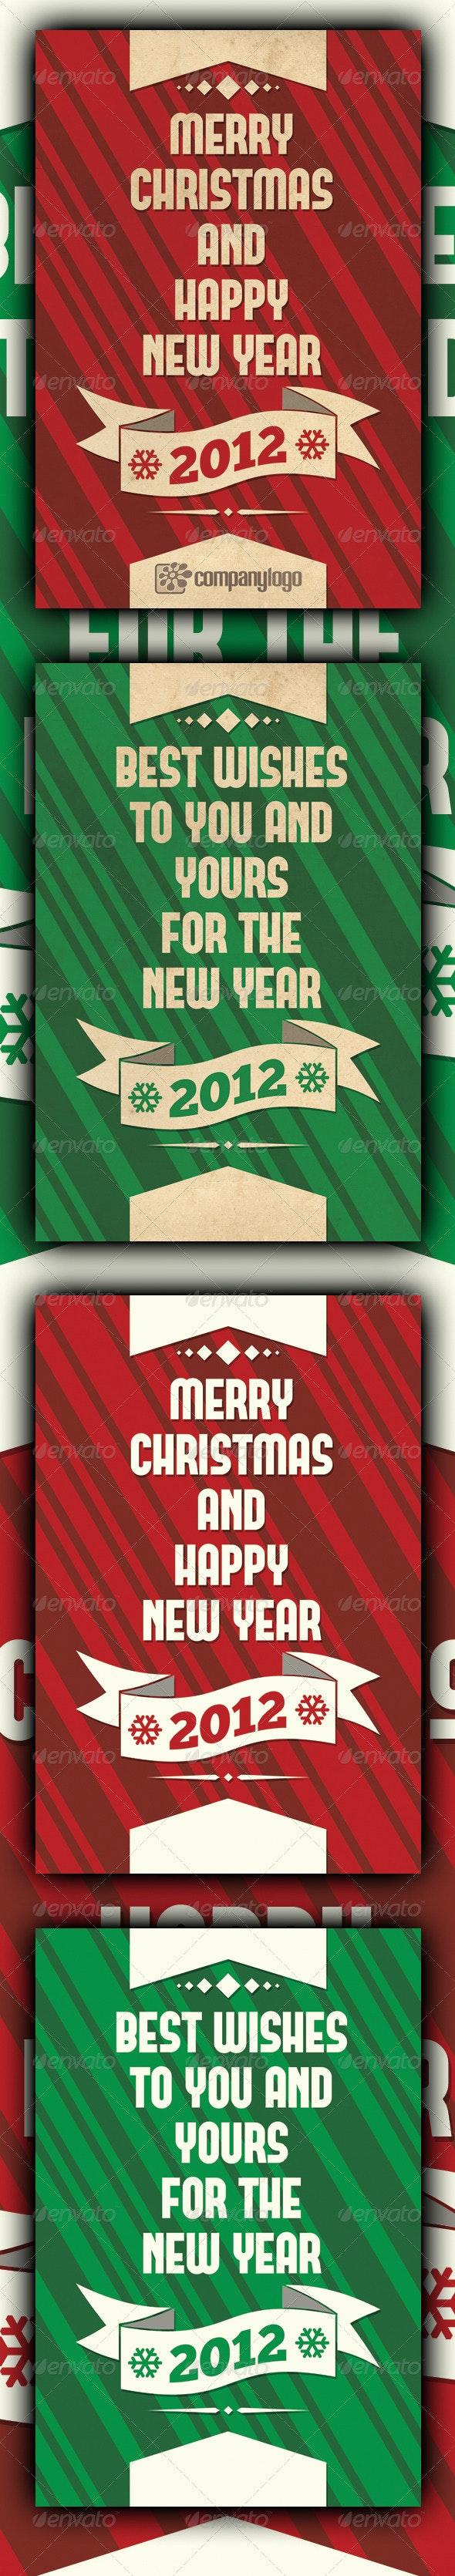 Retro Merry Christmas Card v2 - Holiday Greeting Cards